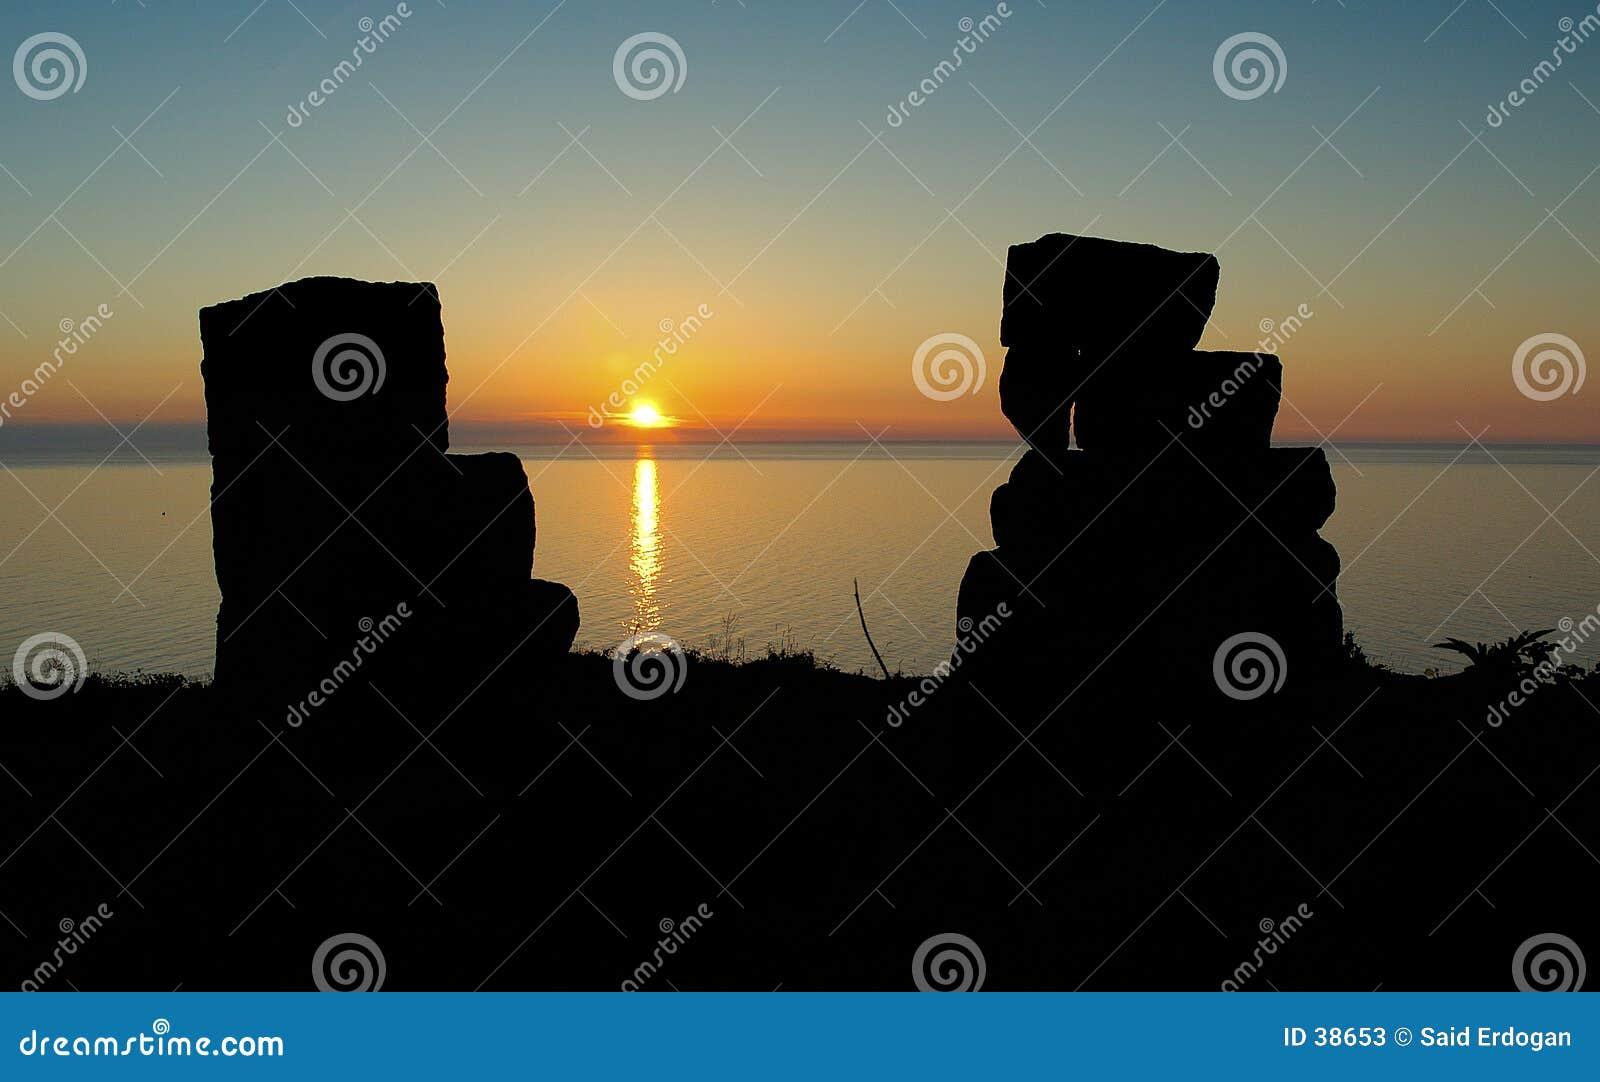 Zamek rujnuje słońca